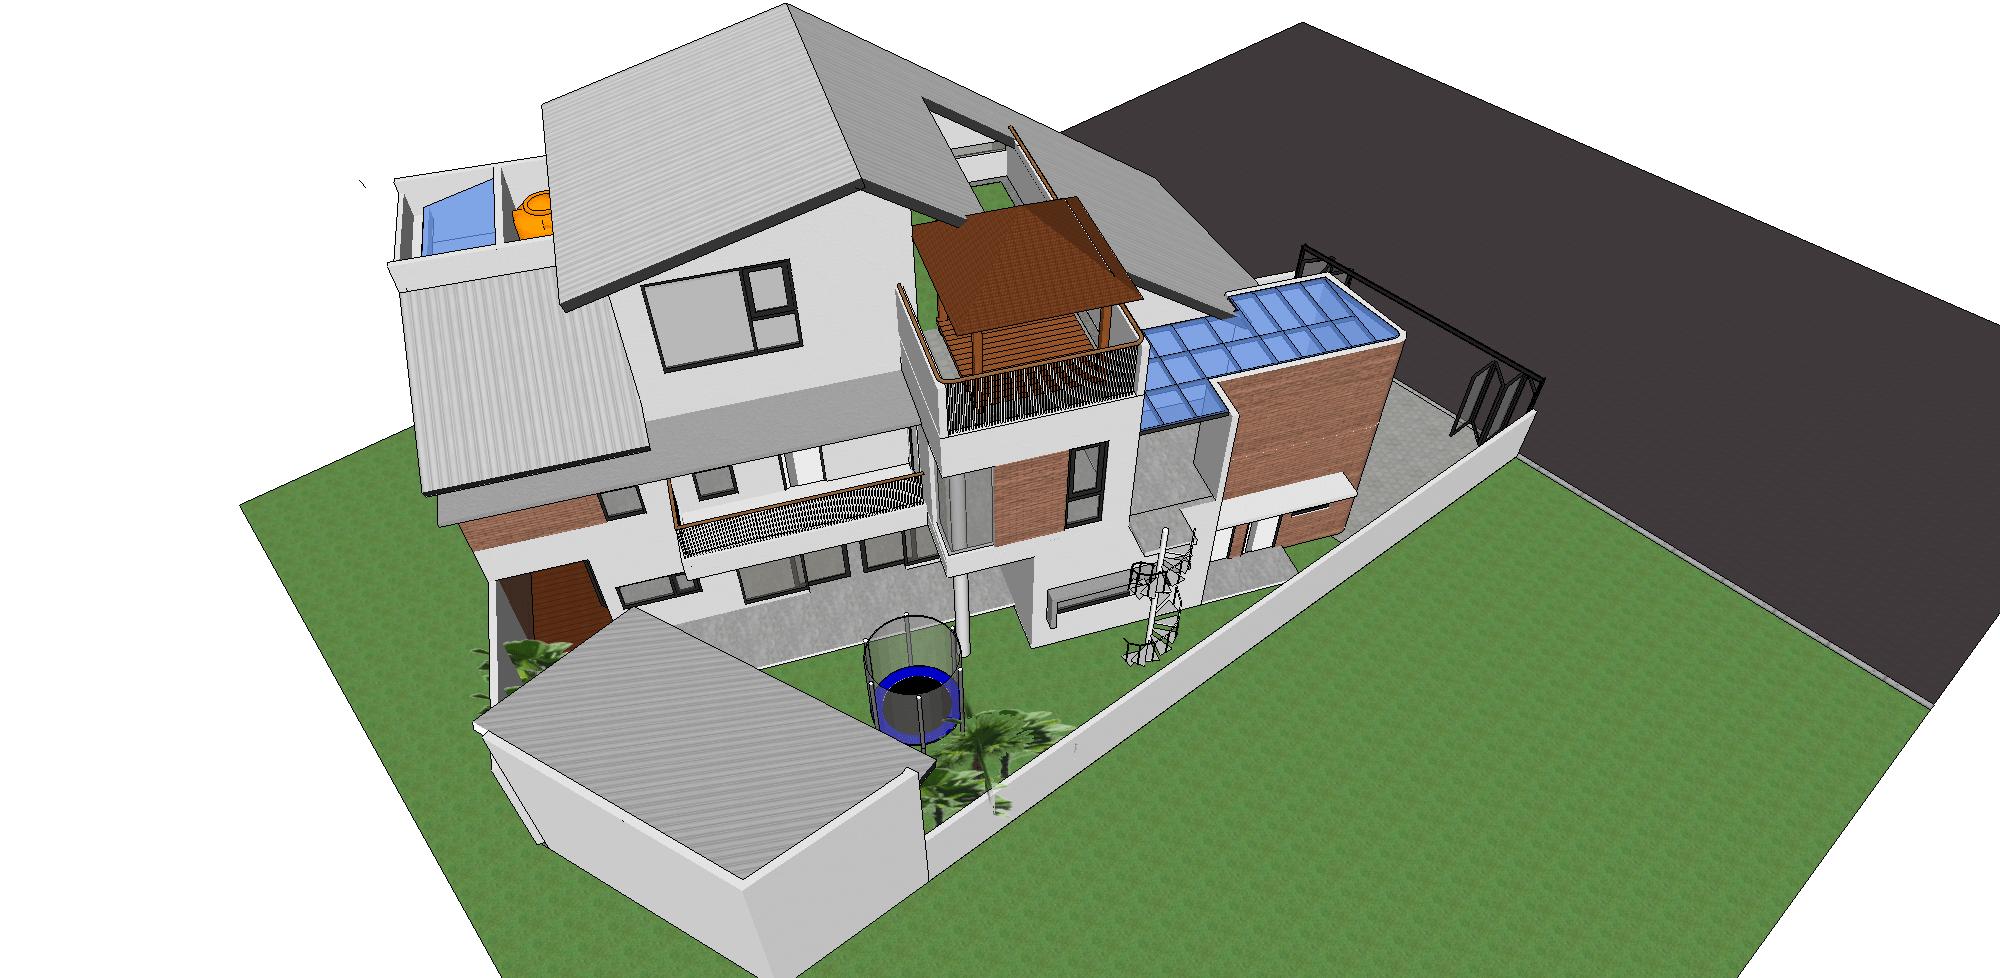 Zigzag Architecture Studio I House - Serpong Garden Cisauk, Tangerang, Banten, Indonesia Cisauk, Tangerang, Banten, Indonesia Zigzag-Architecture-Studio-I-House-Serpong-Garden   56166